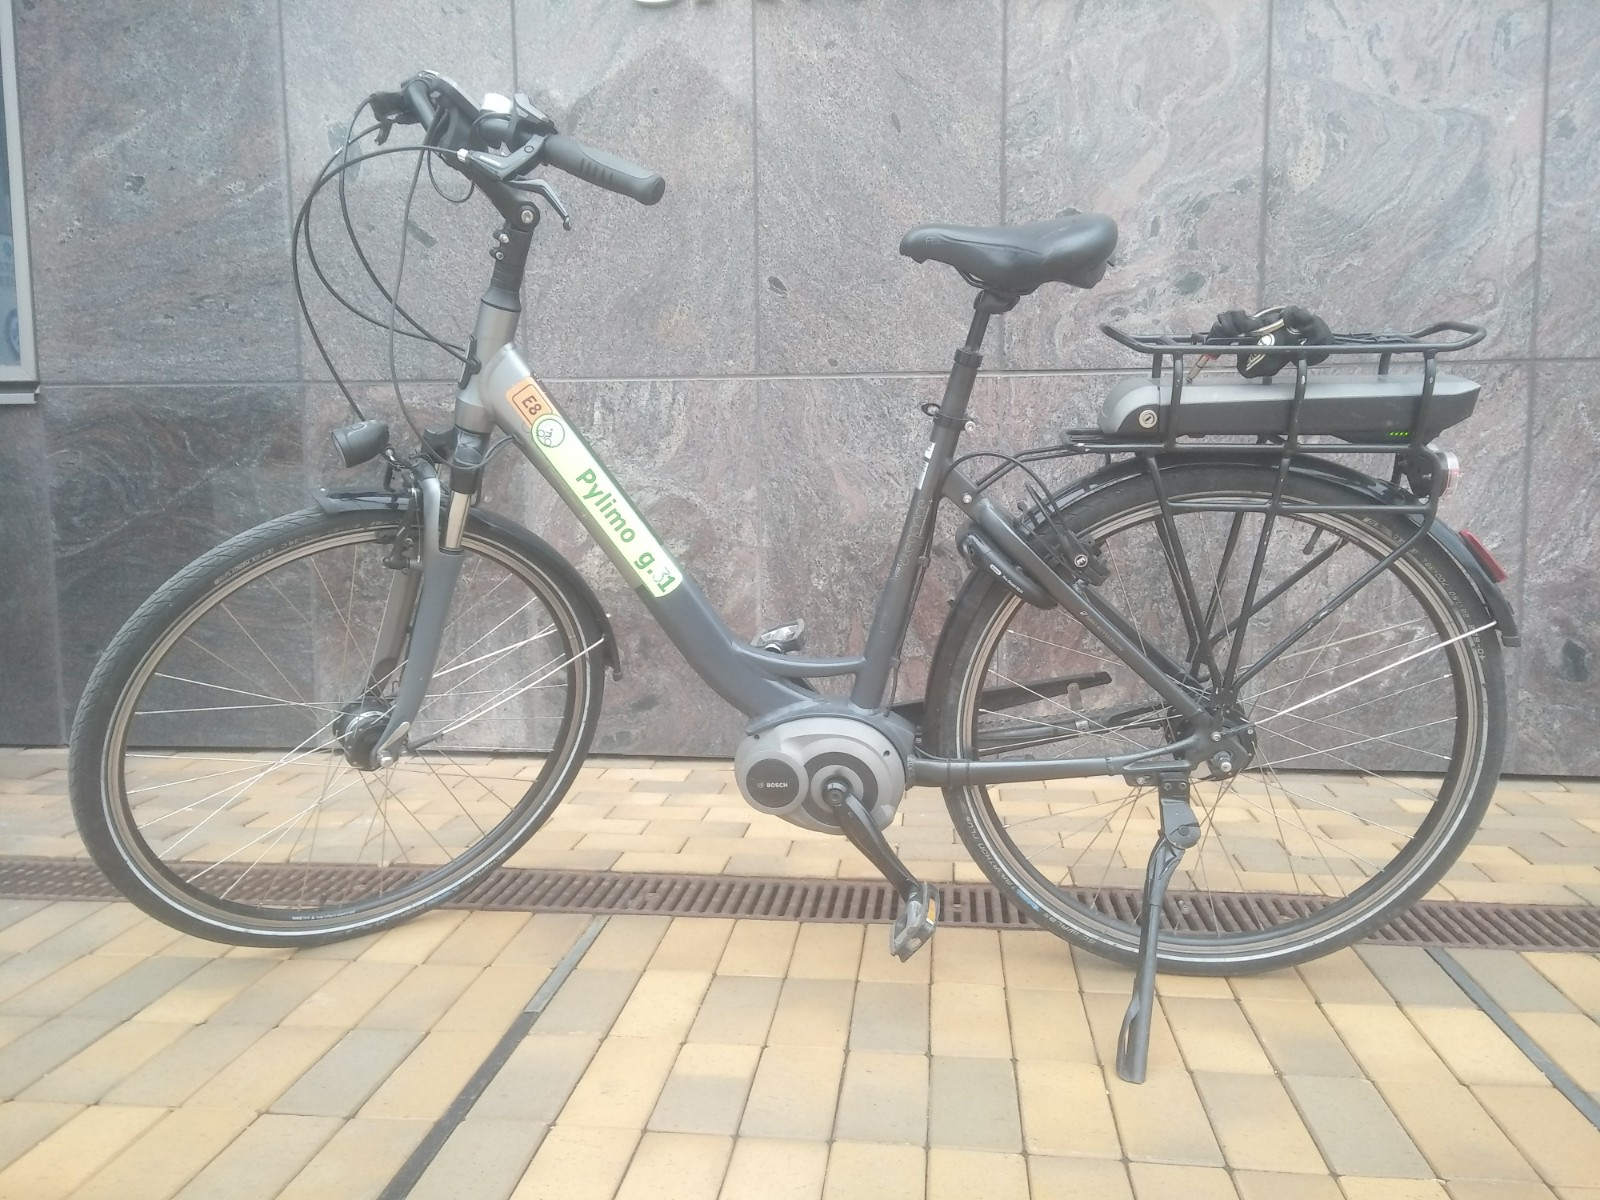 E-Bikes/Pedelec - fast, easy & fun